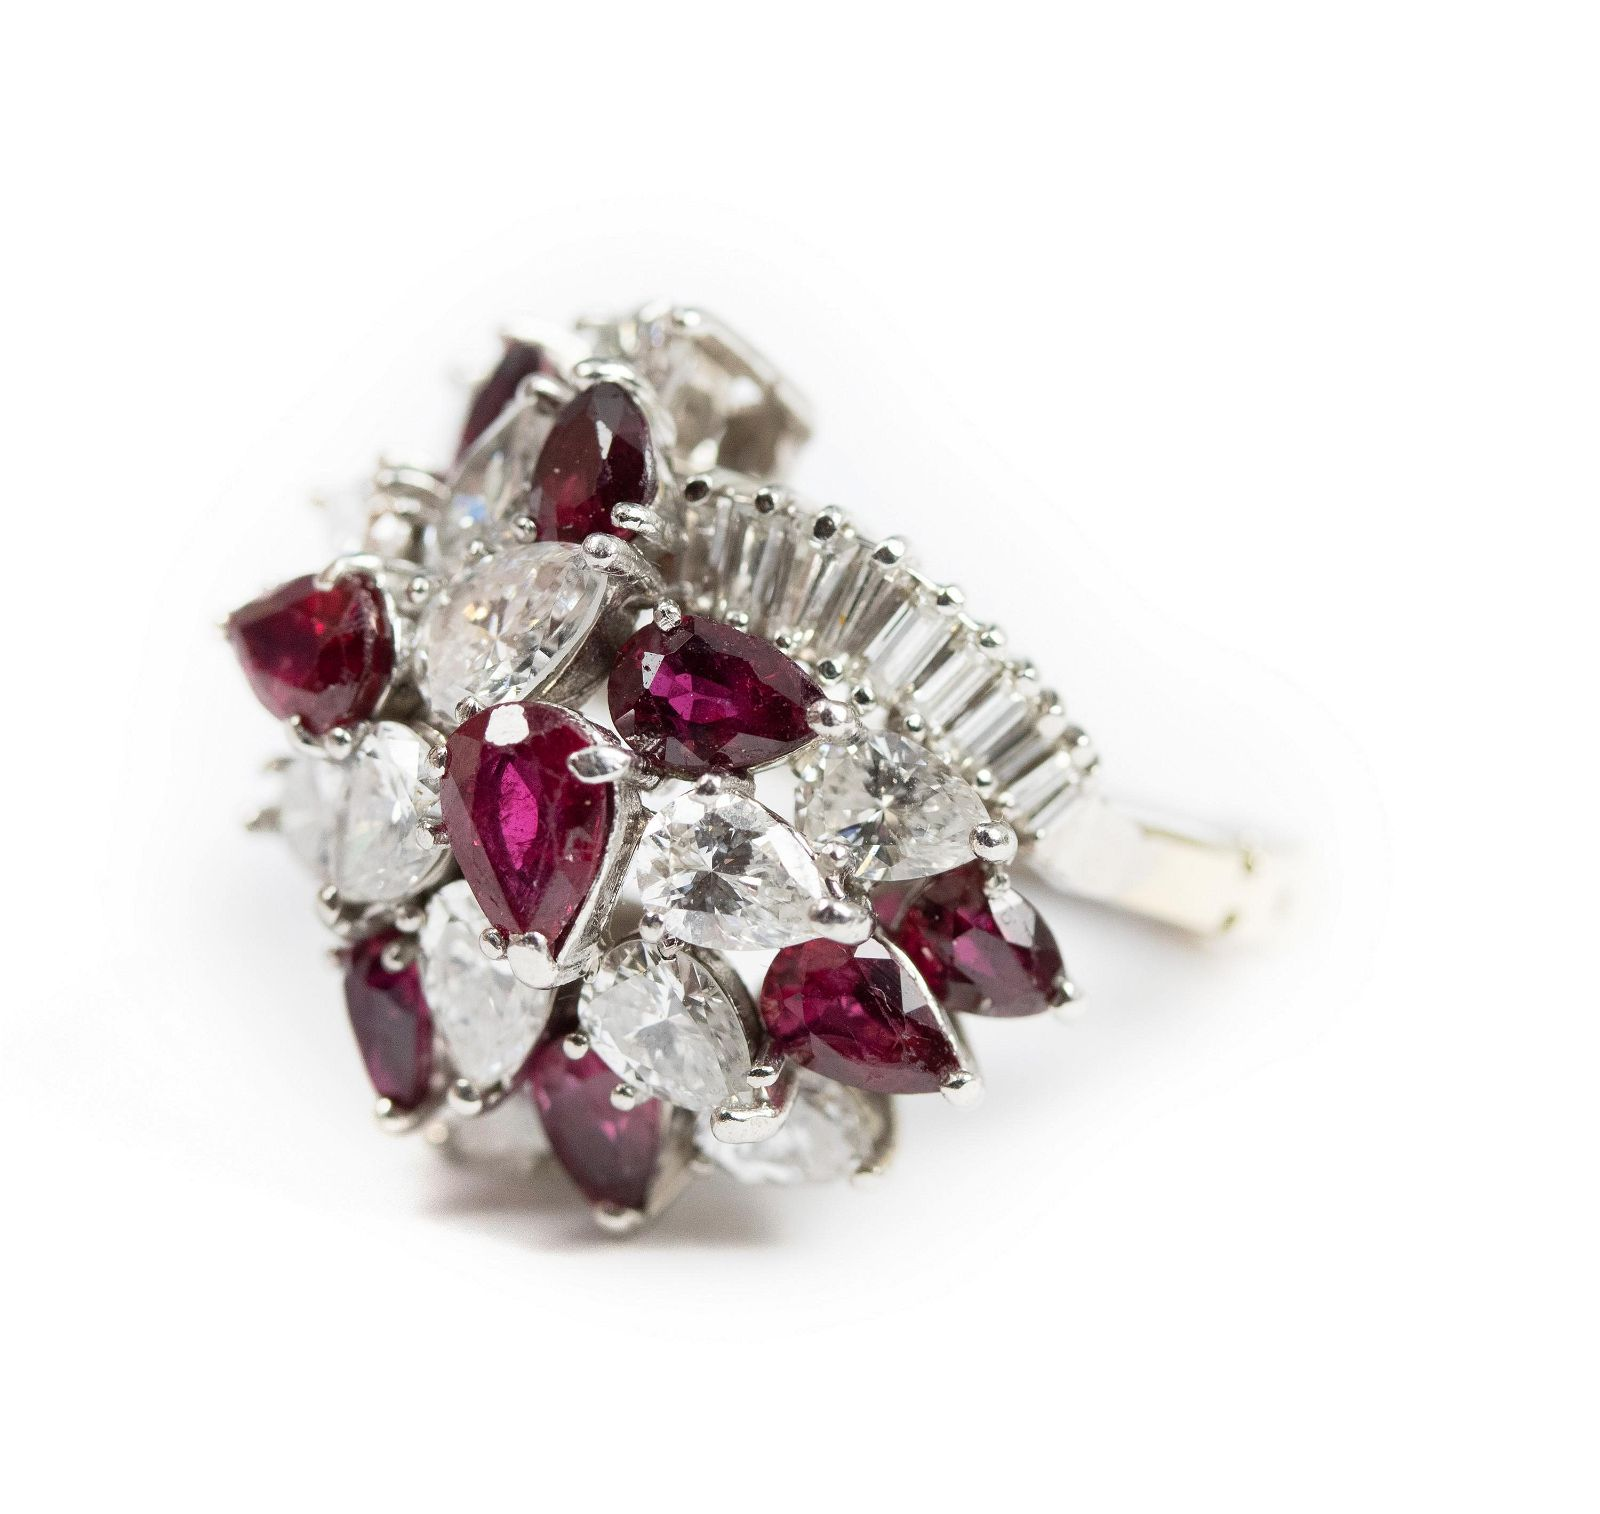 Platinum 5.58 CTTW Ruby Diamond Cocktail Ring